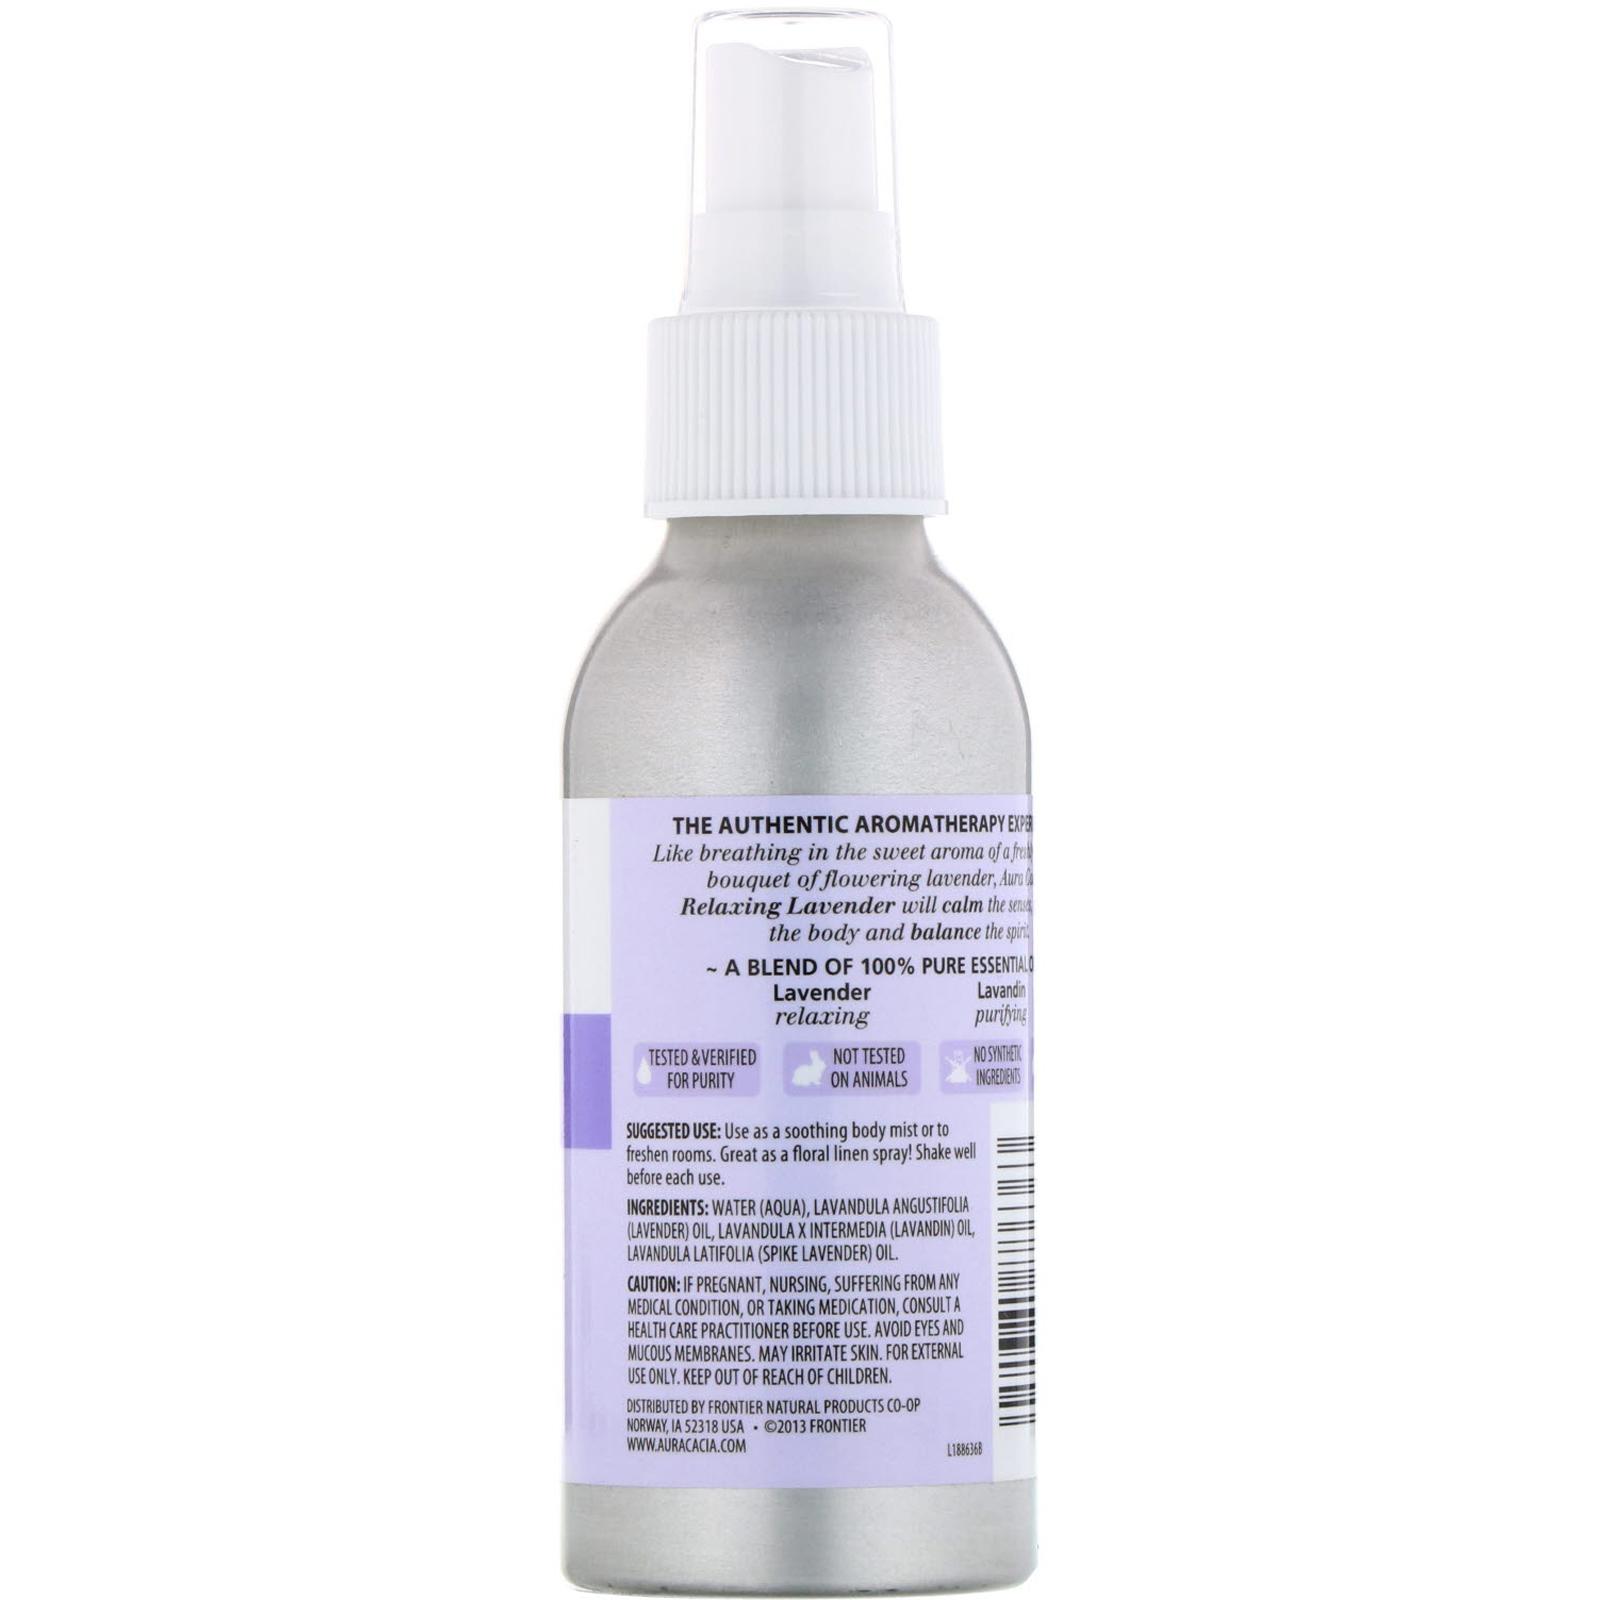 Aura Cacia Aromatherapy Room Body Mist Relaxing Lavender 4 Fl Oz 118 Ml